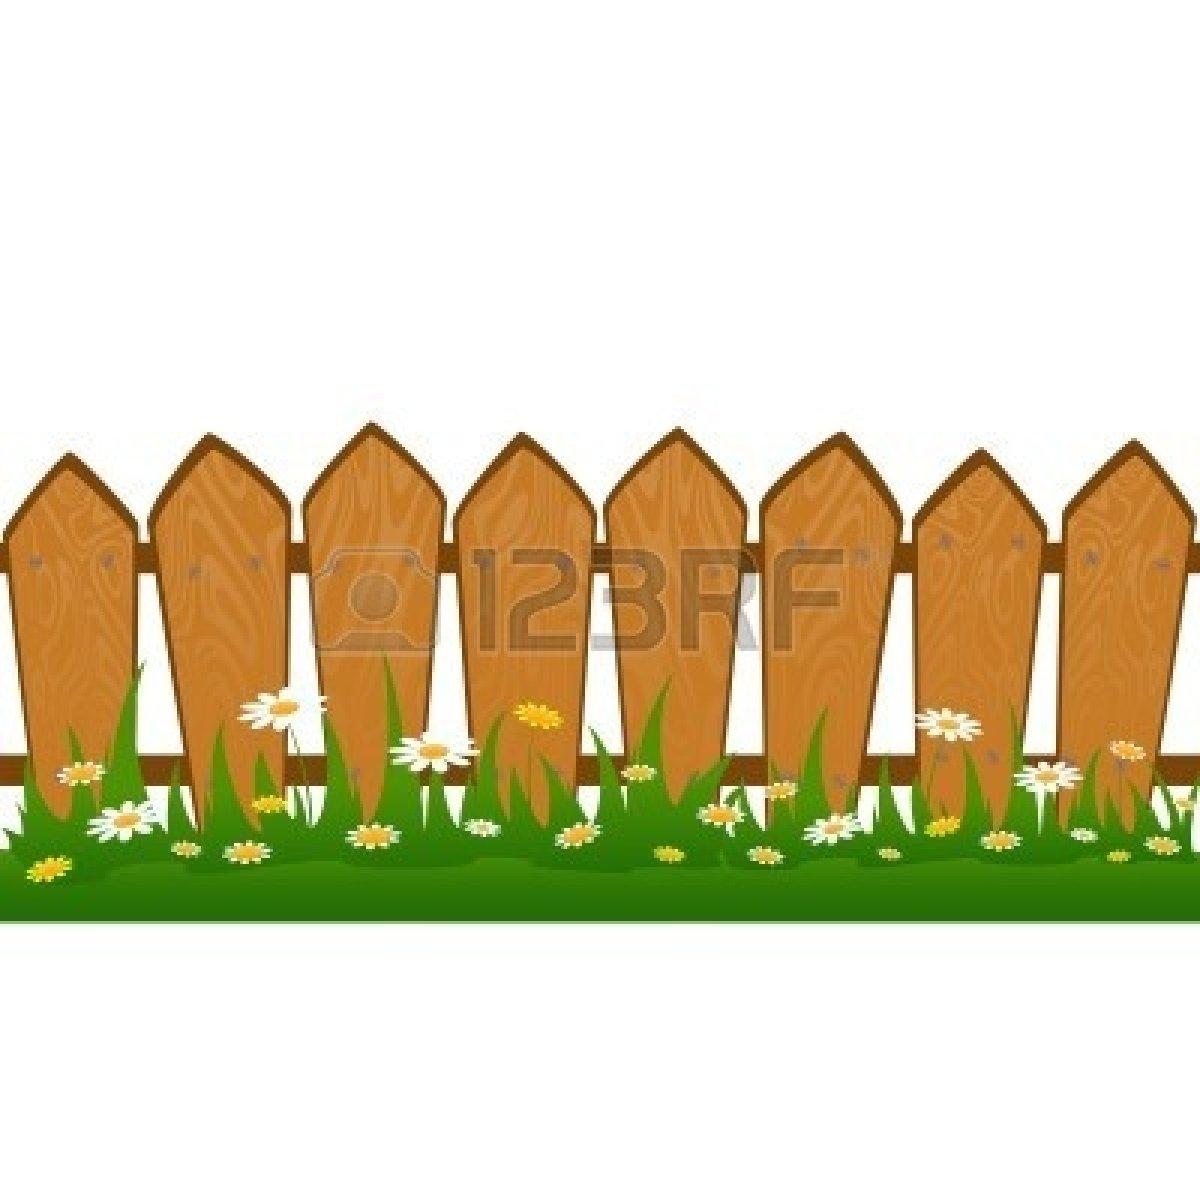 Clip art borders panda. Barn clipart fence